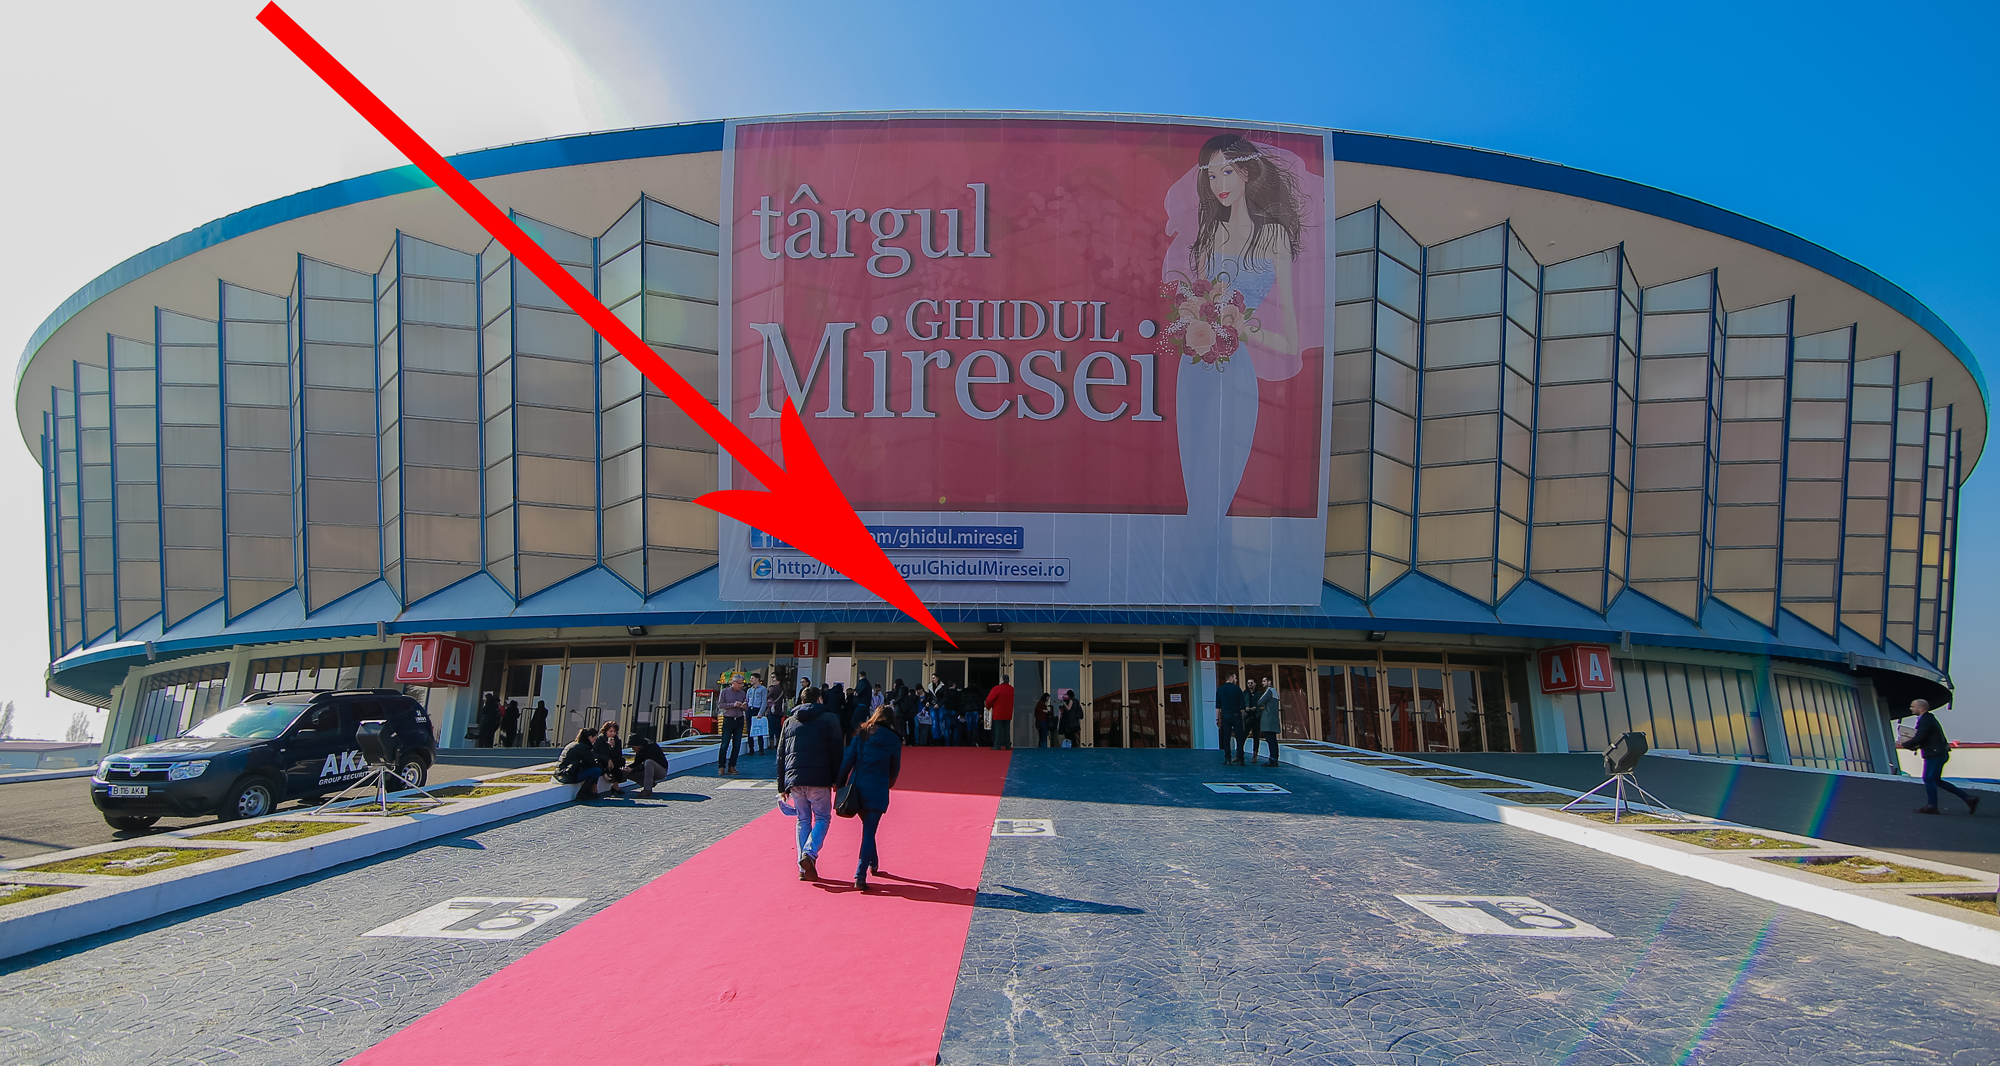 Targul Ghidul Miresei, 26-28 februarie 2016, Romexpo